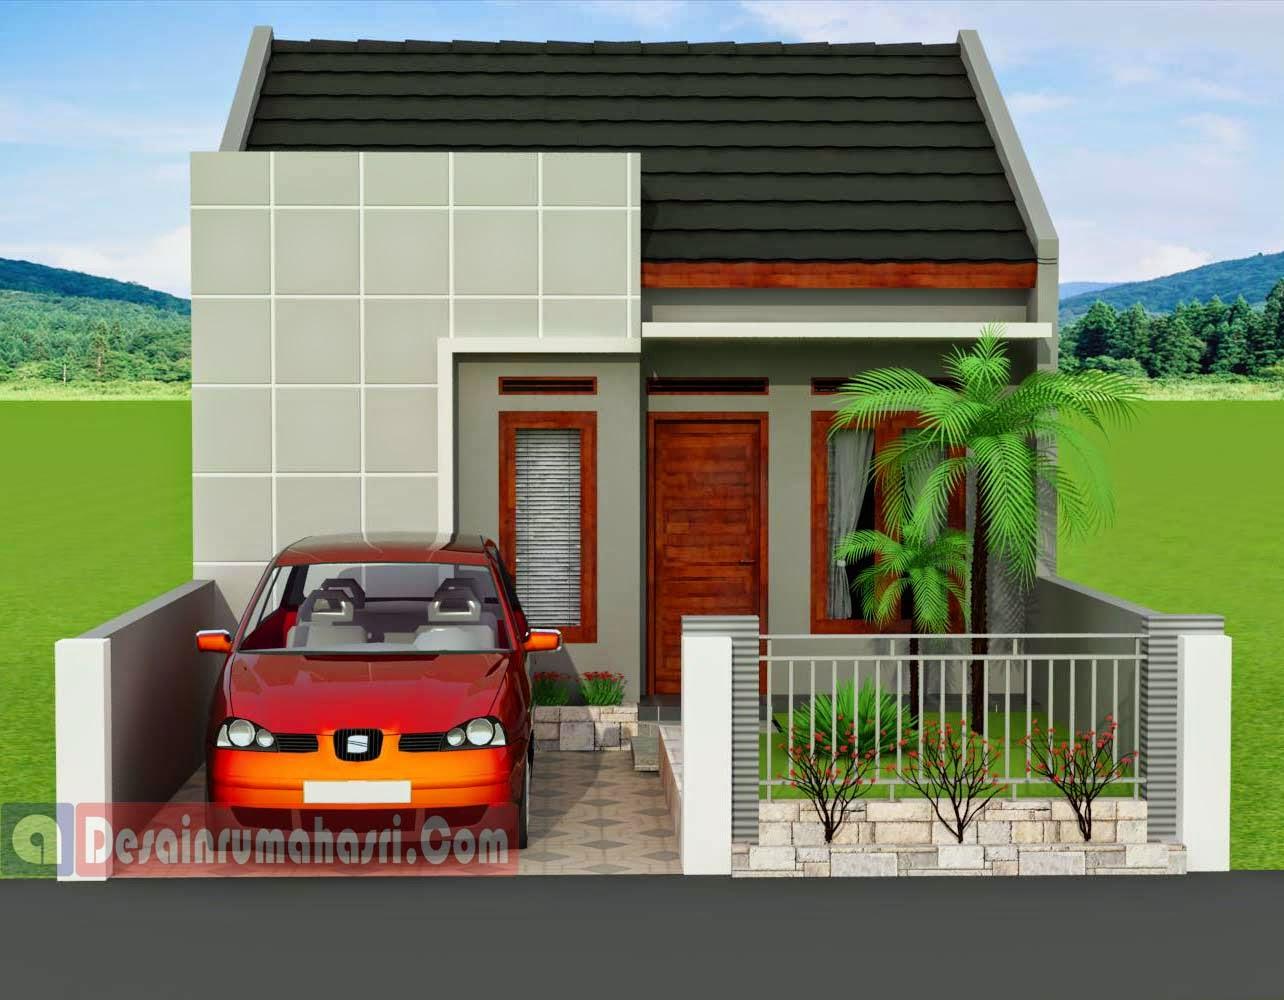 Desain Rumah Minimalis 1 Lantai Type 36 - Foto Desain ...